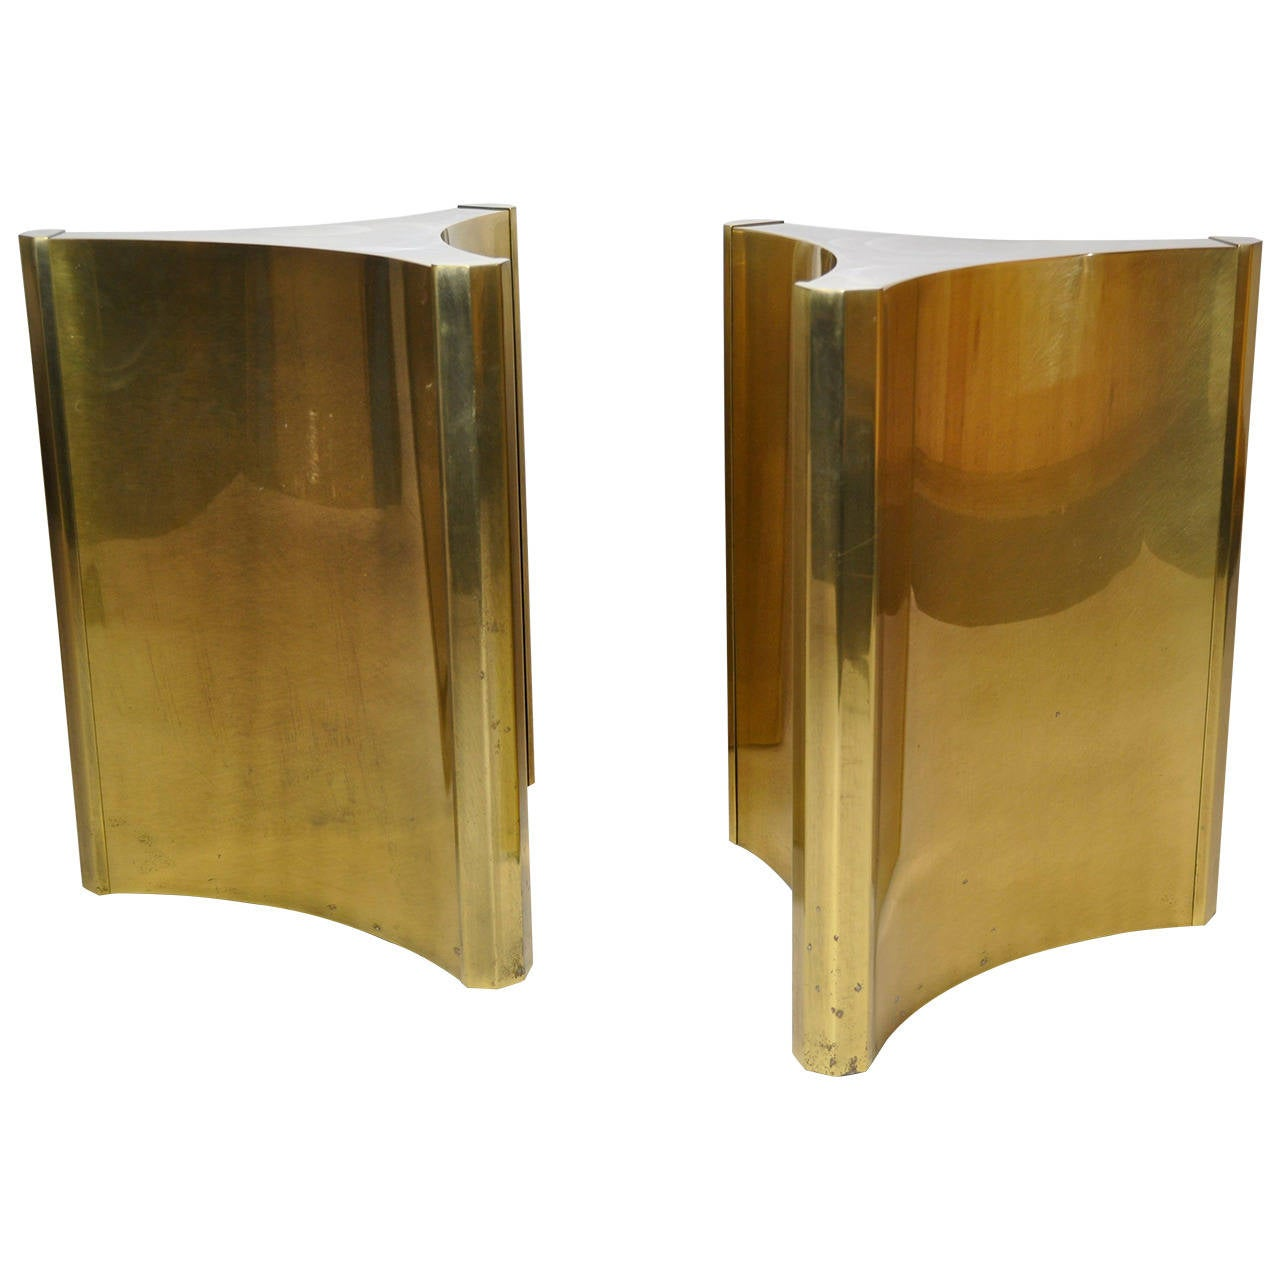 Mastercraft brass dining table - Pair Of Mastercraft Brass Dining Table Pedestals 1